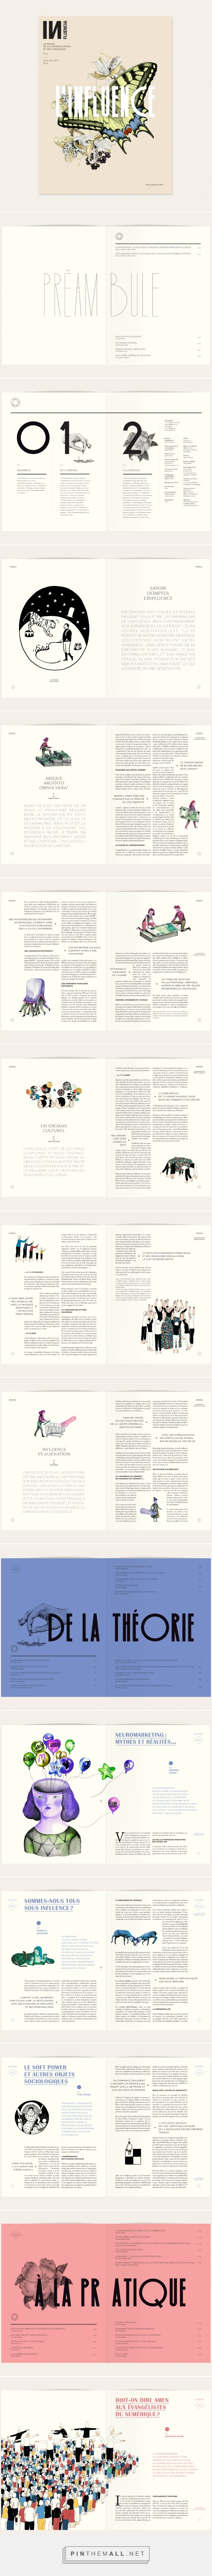 Influencia n°13 on Behance - created via http://pinthemall.net